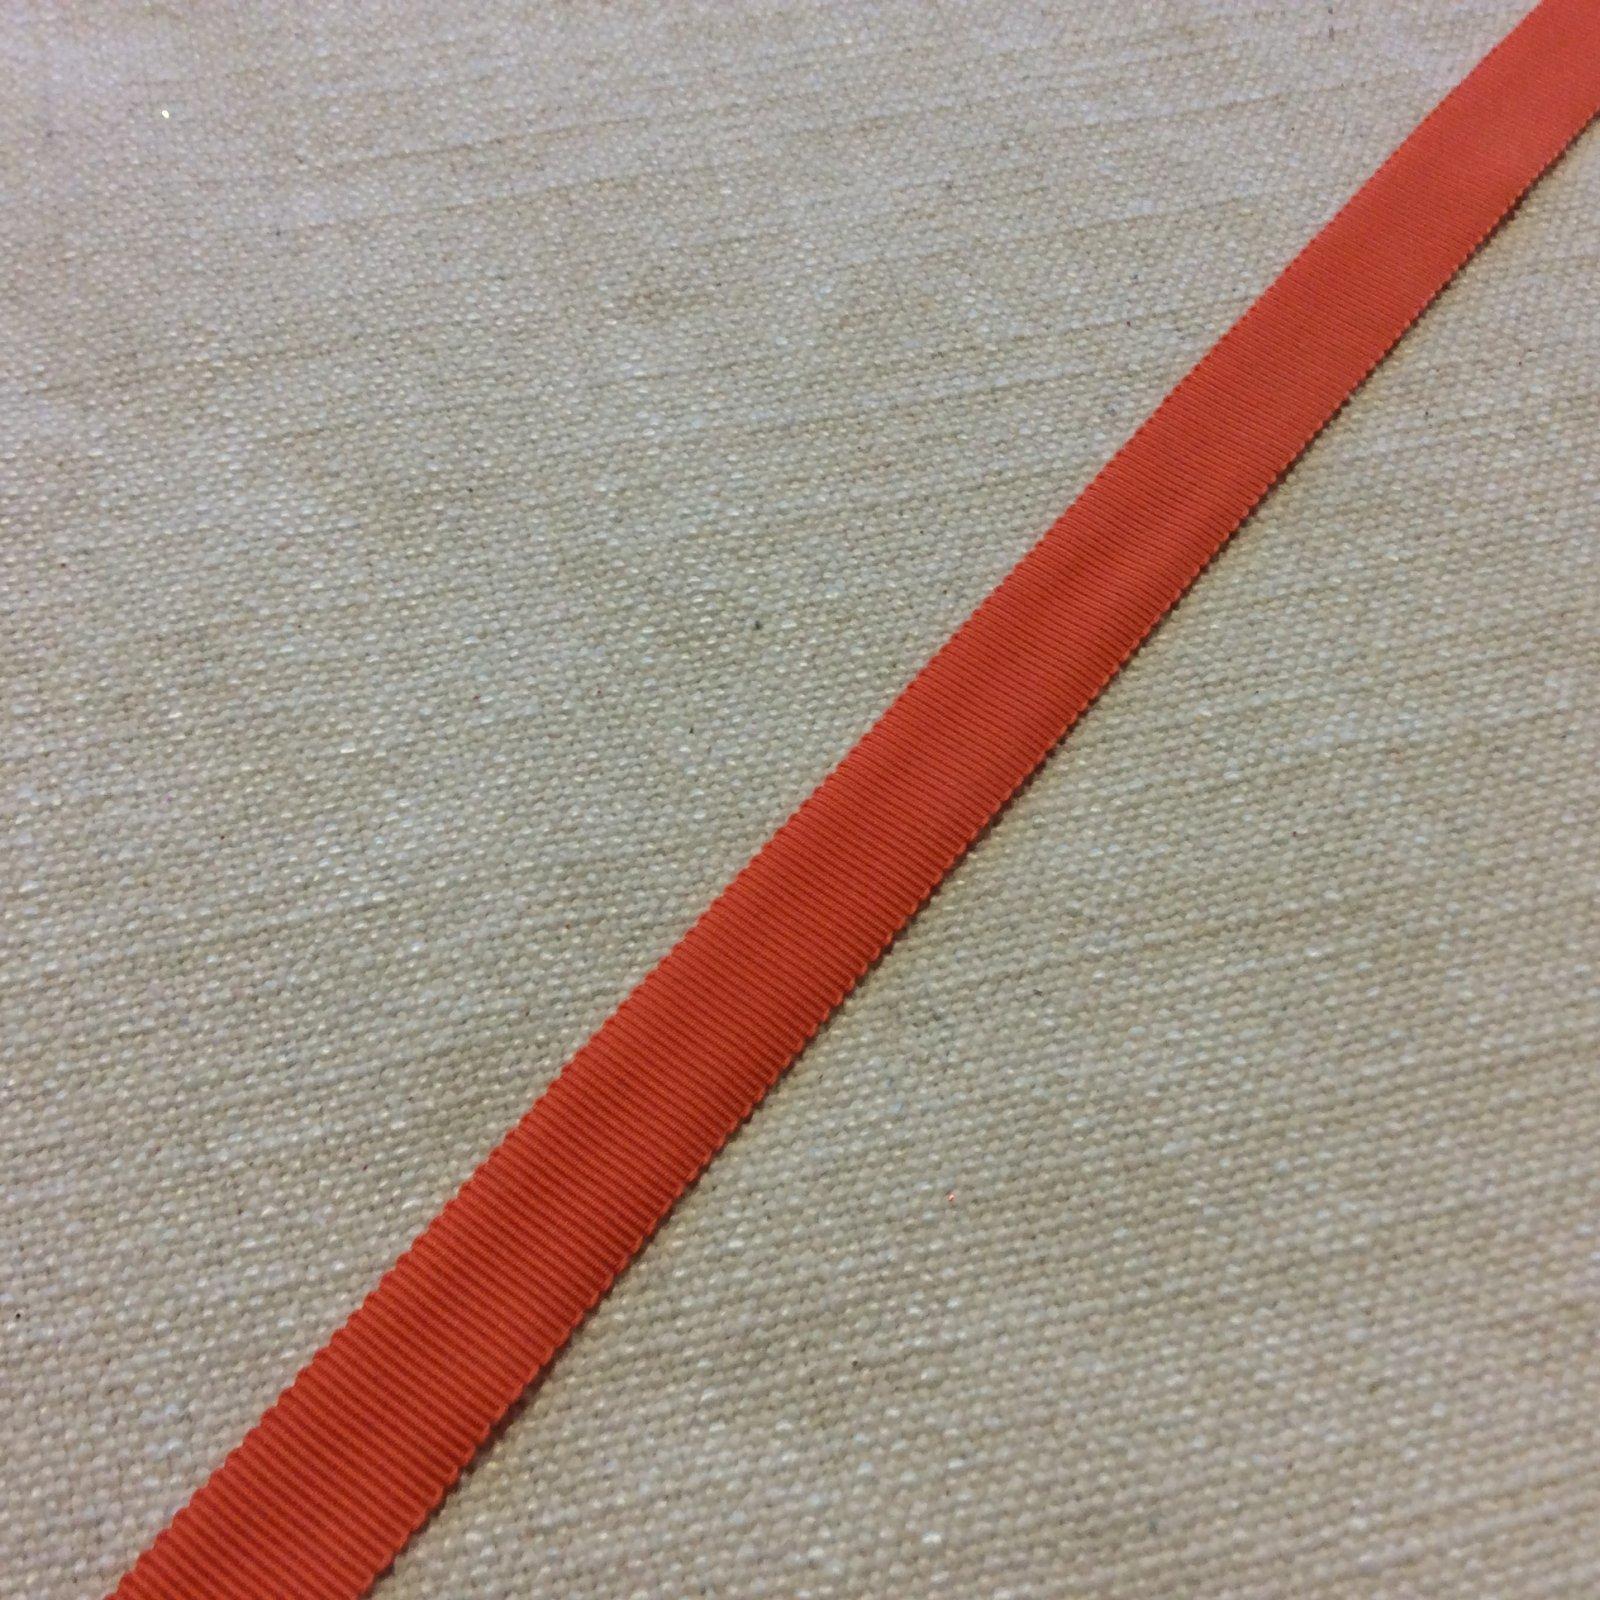 Grosgrain Ribbon 5/8 High End Japanese Woven Orange Trim Ribbon RIB1169